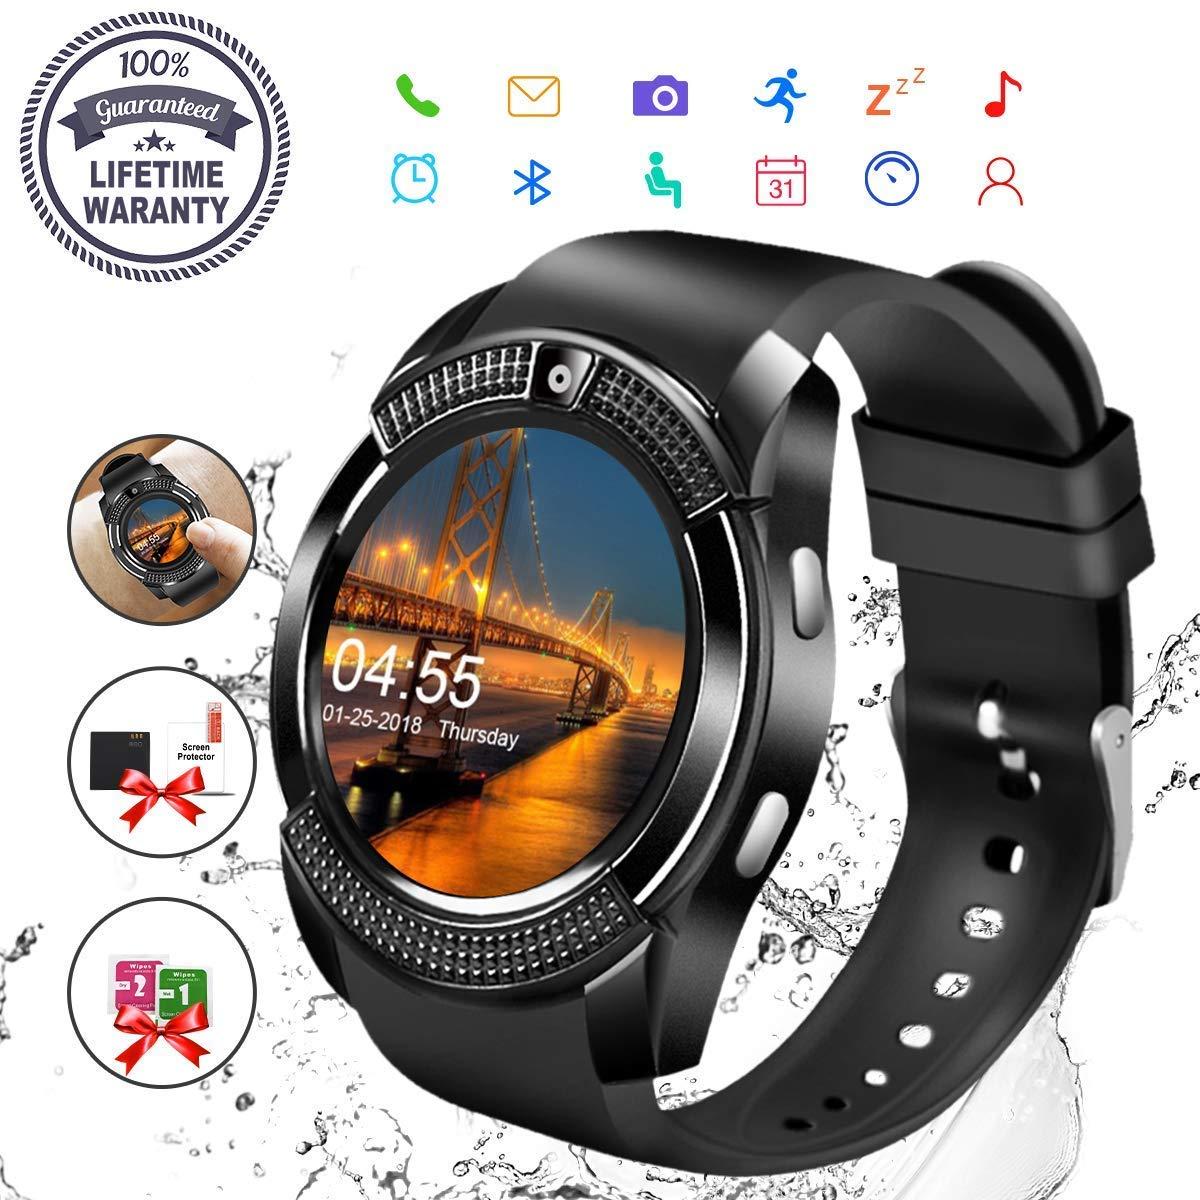 Amazon.com: Smart Watch,Bluetooth Smartwatch Touch Screen ...